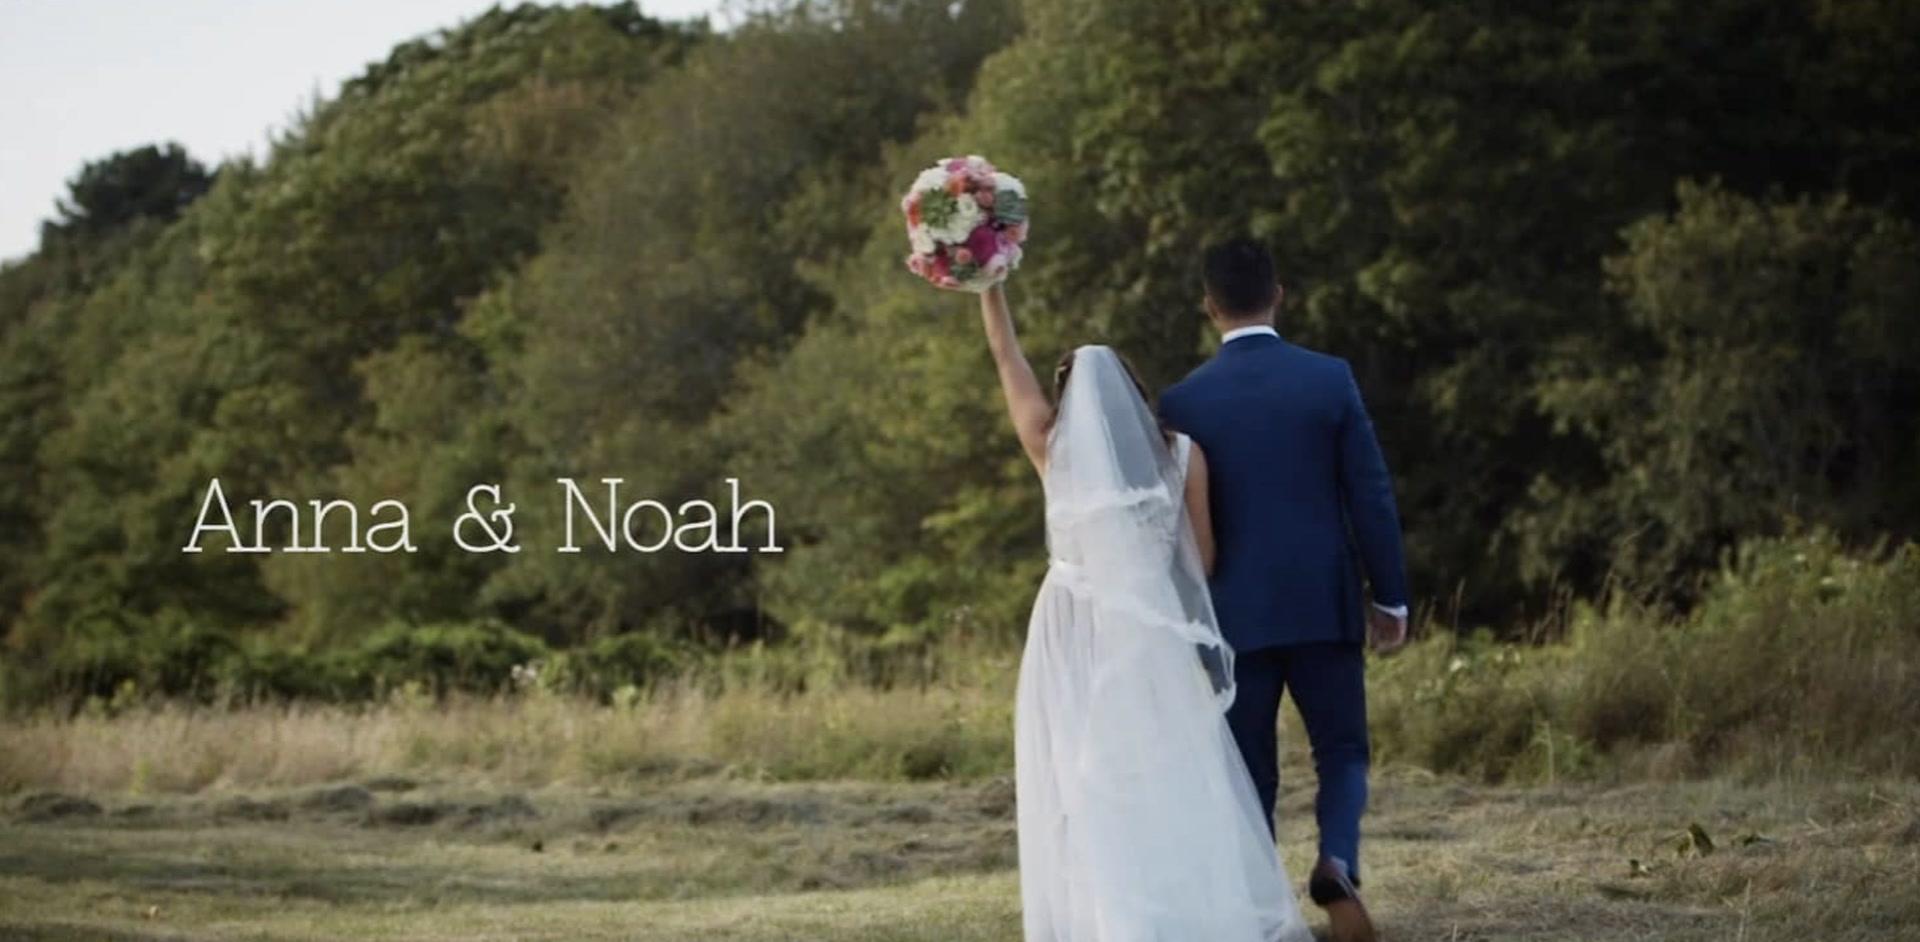 Anna + Noah | Wells, Maine | laudholm farm